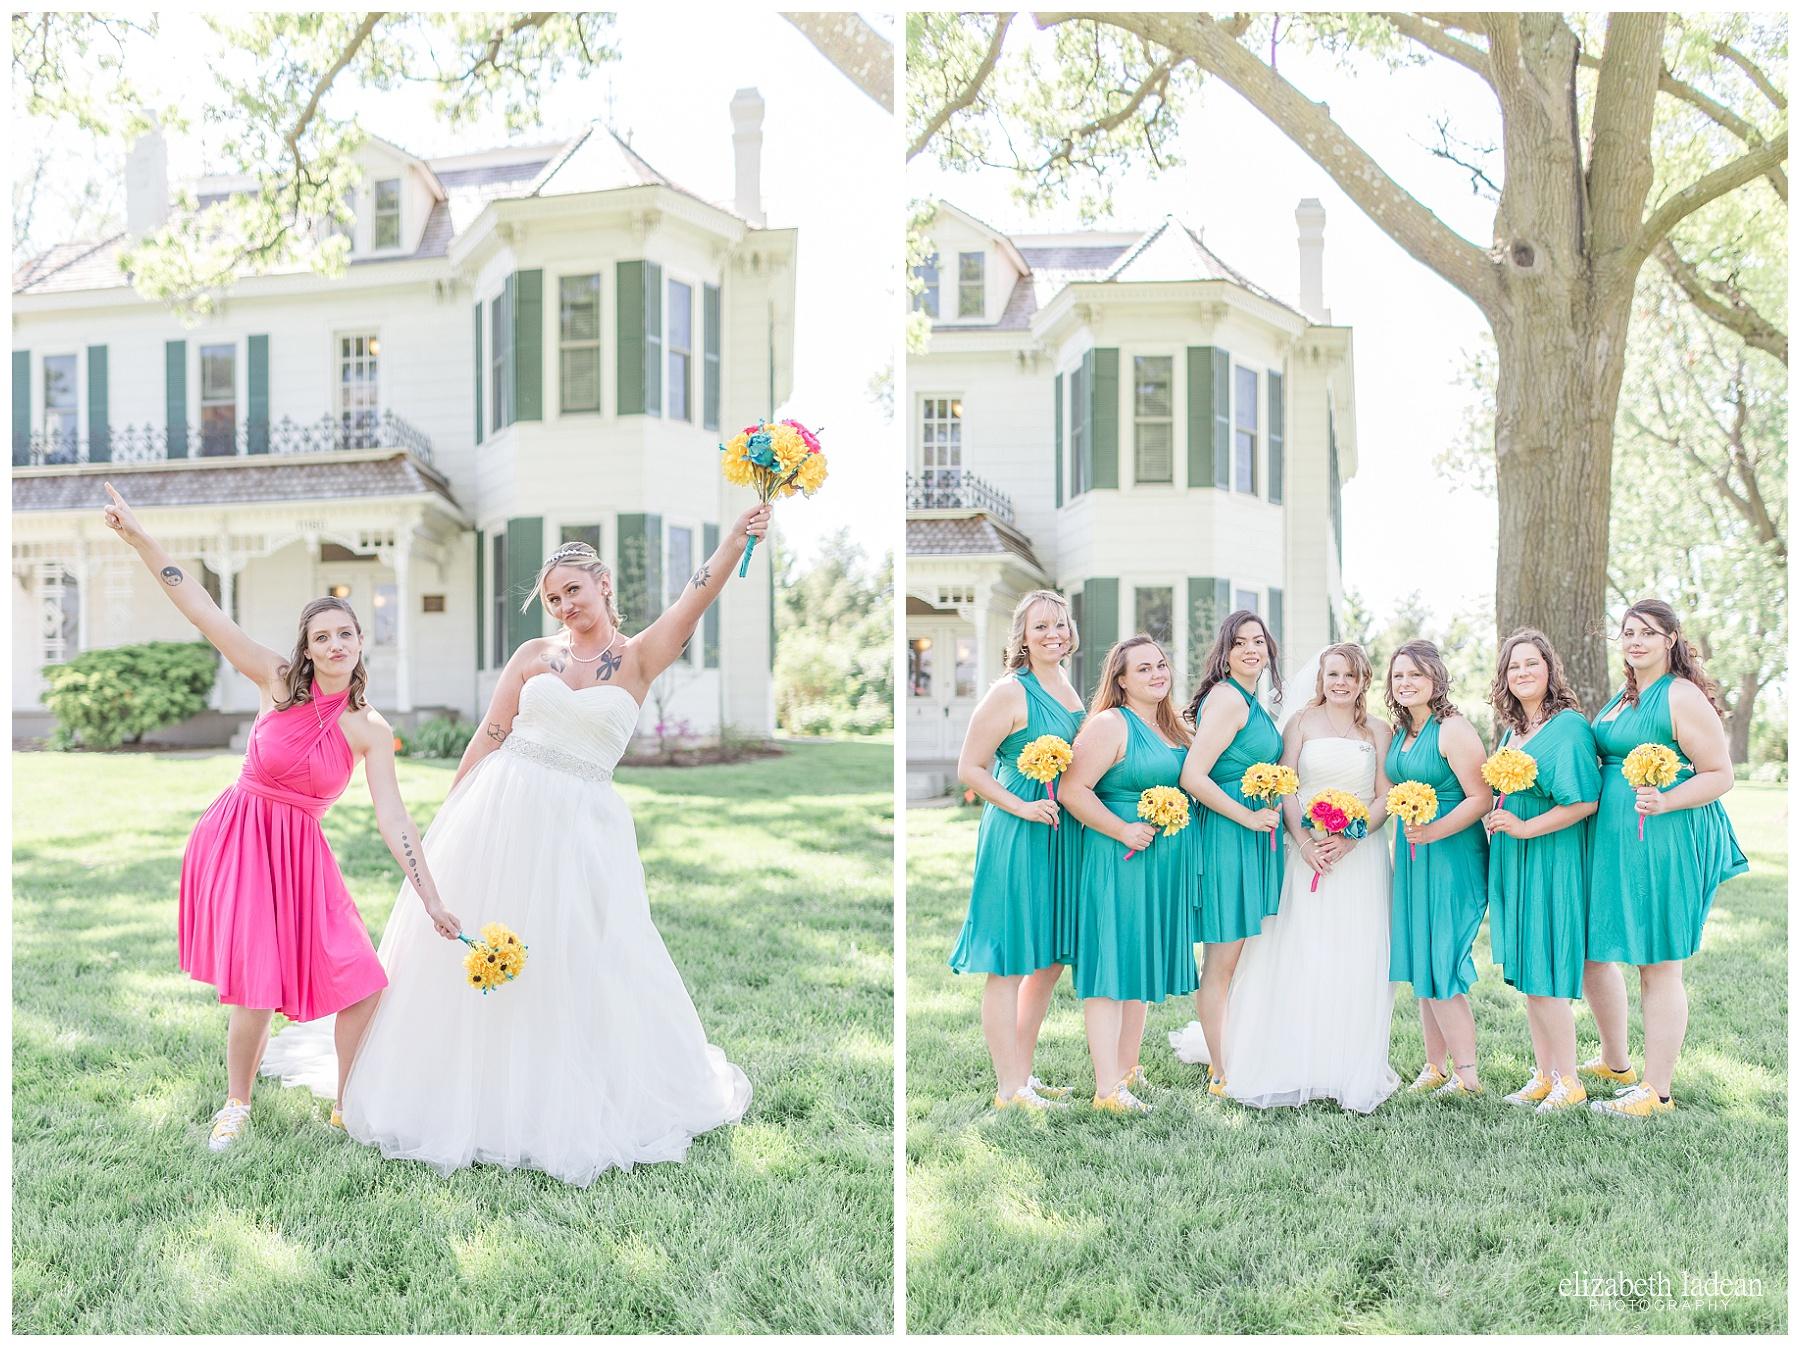 Thompson-Barn-Kansas-Wedding-Photography-R+J-0505-Elizabeth-Ladean-Photography-photo_0707.jpg